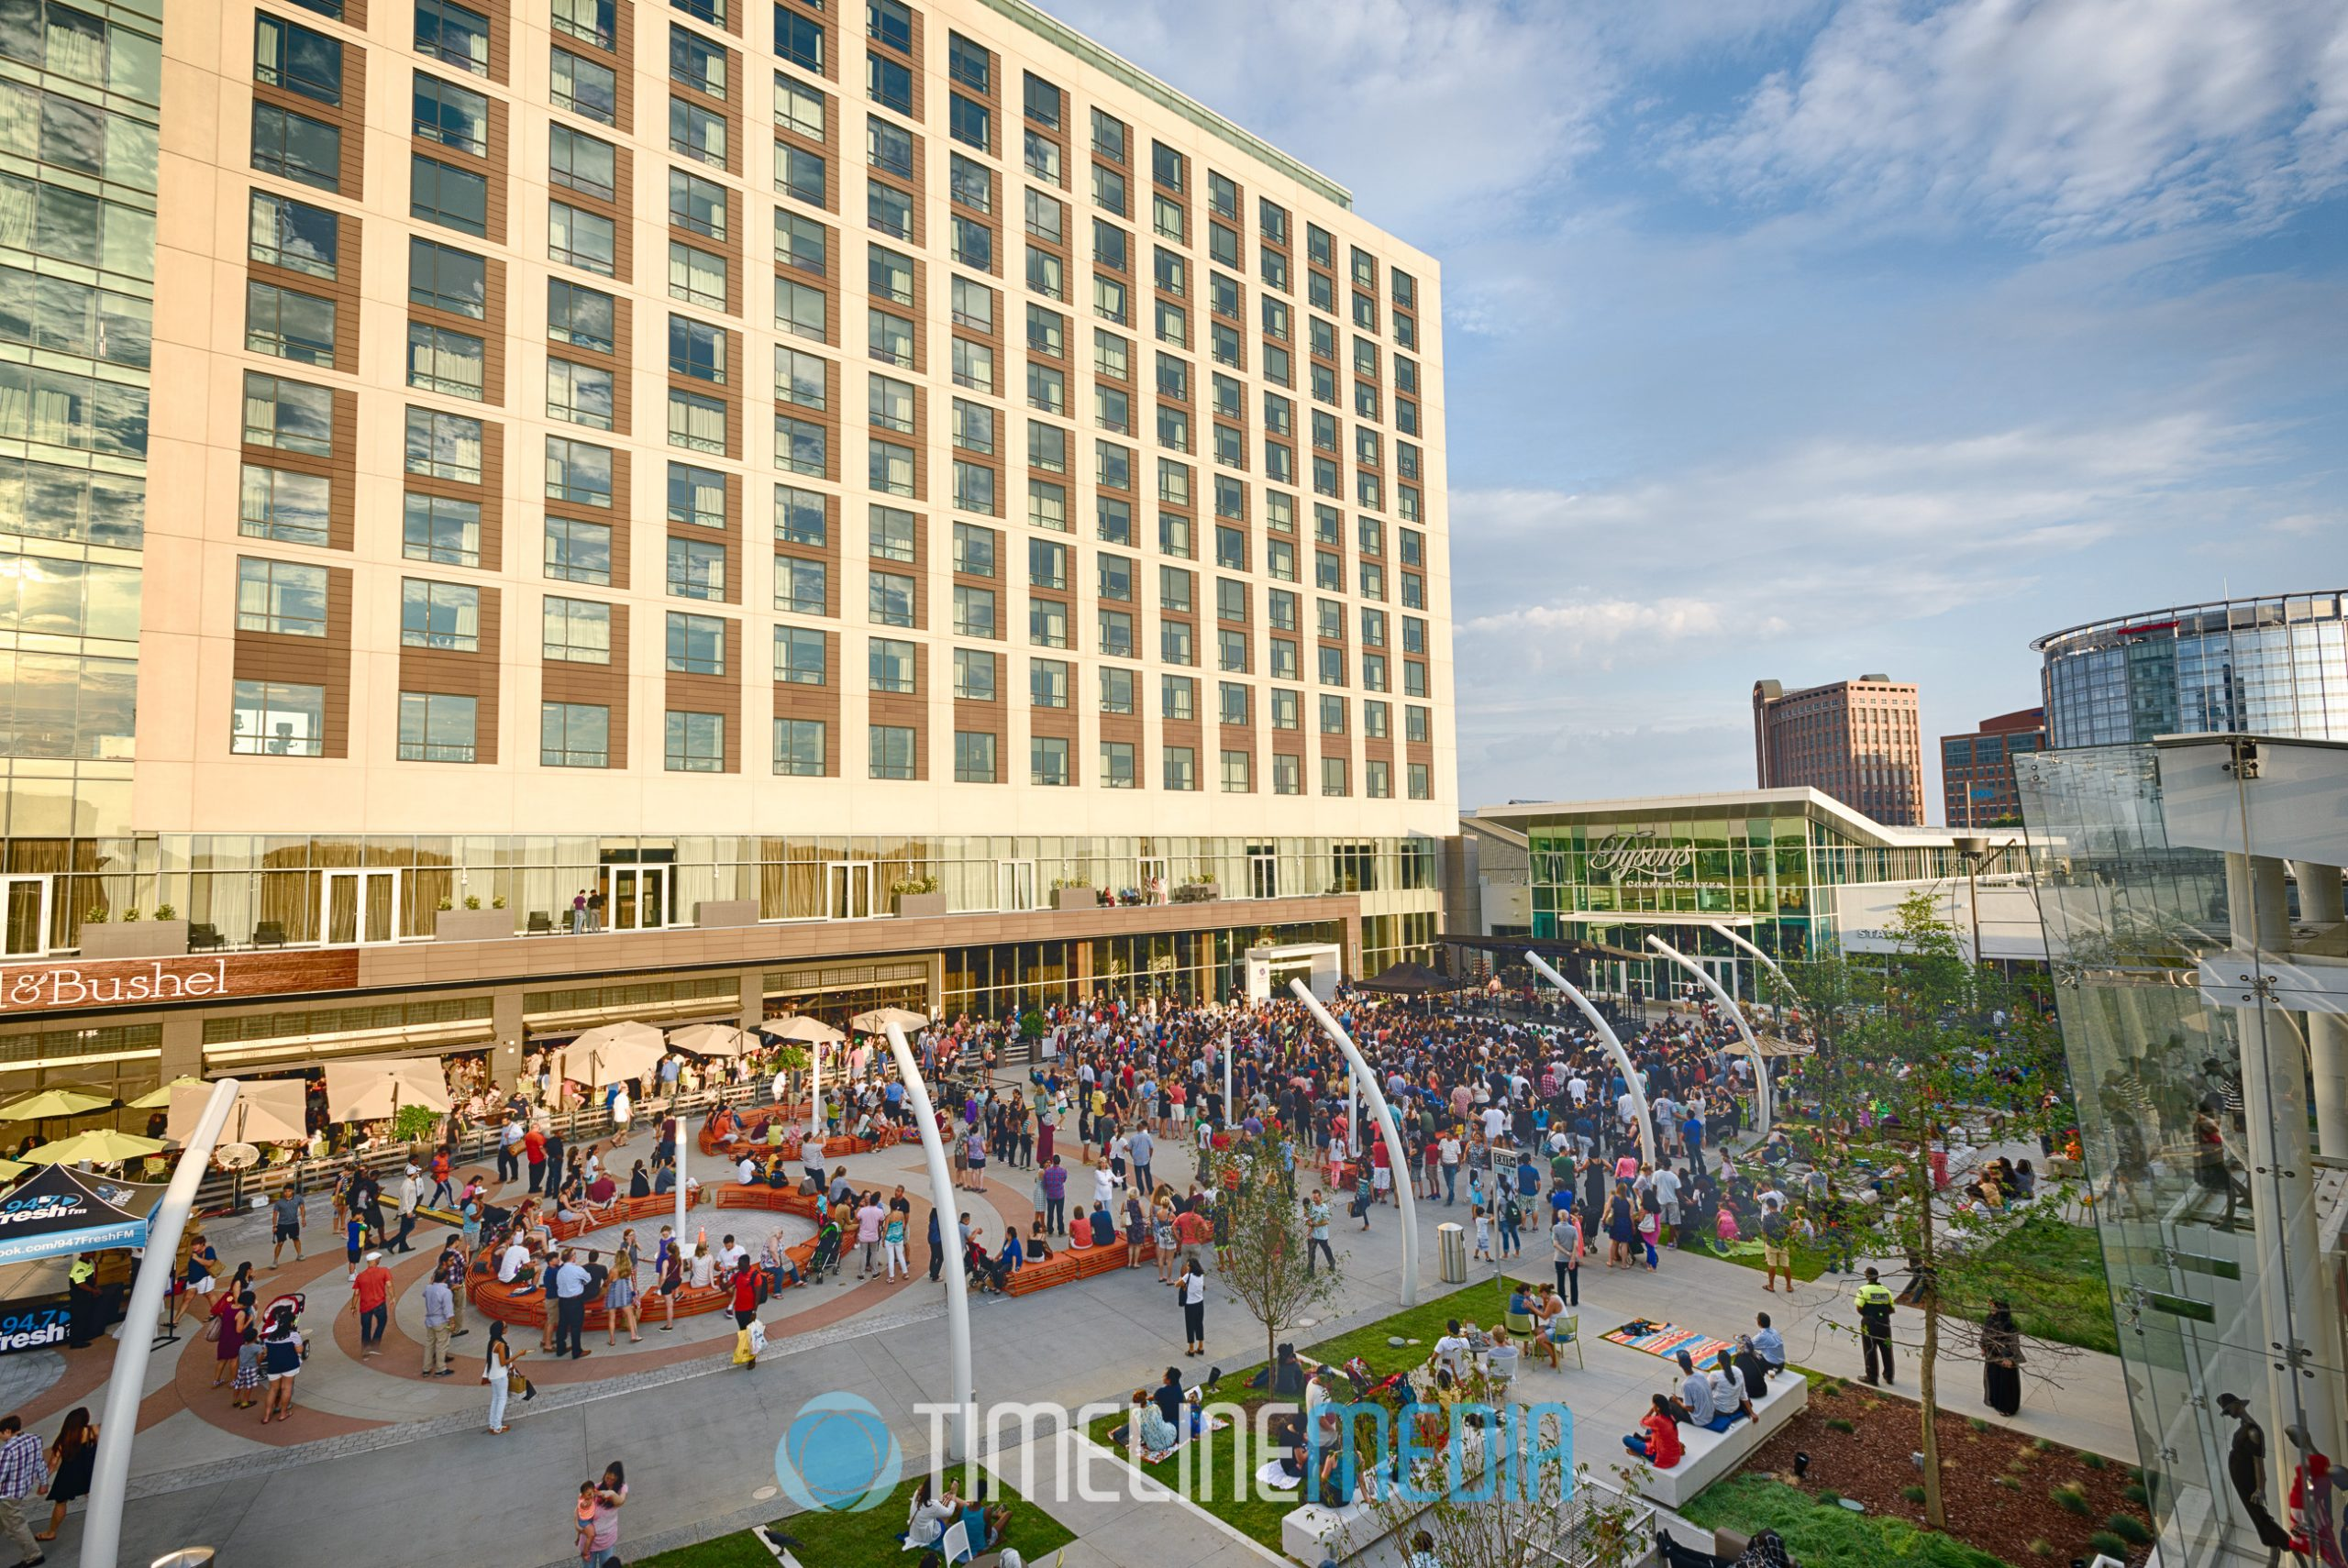 2016 Plaza Summer events at Macerich Tysons Corner Center